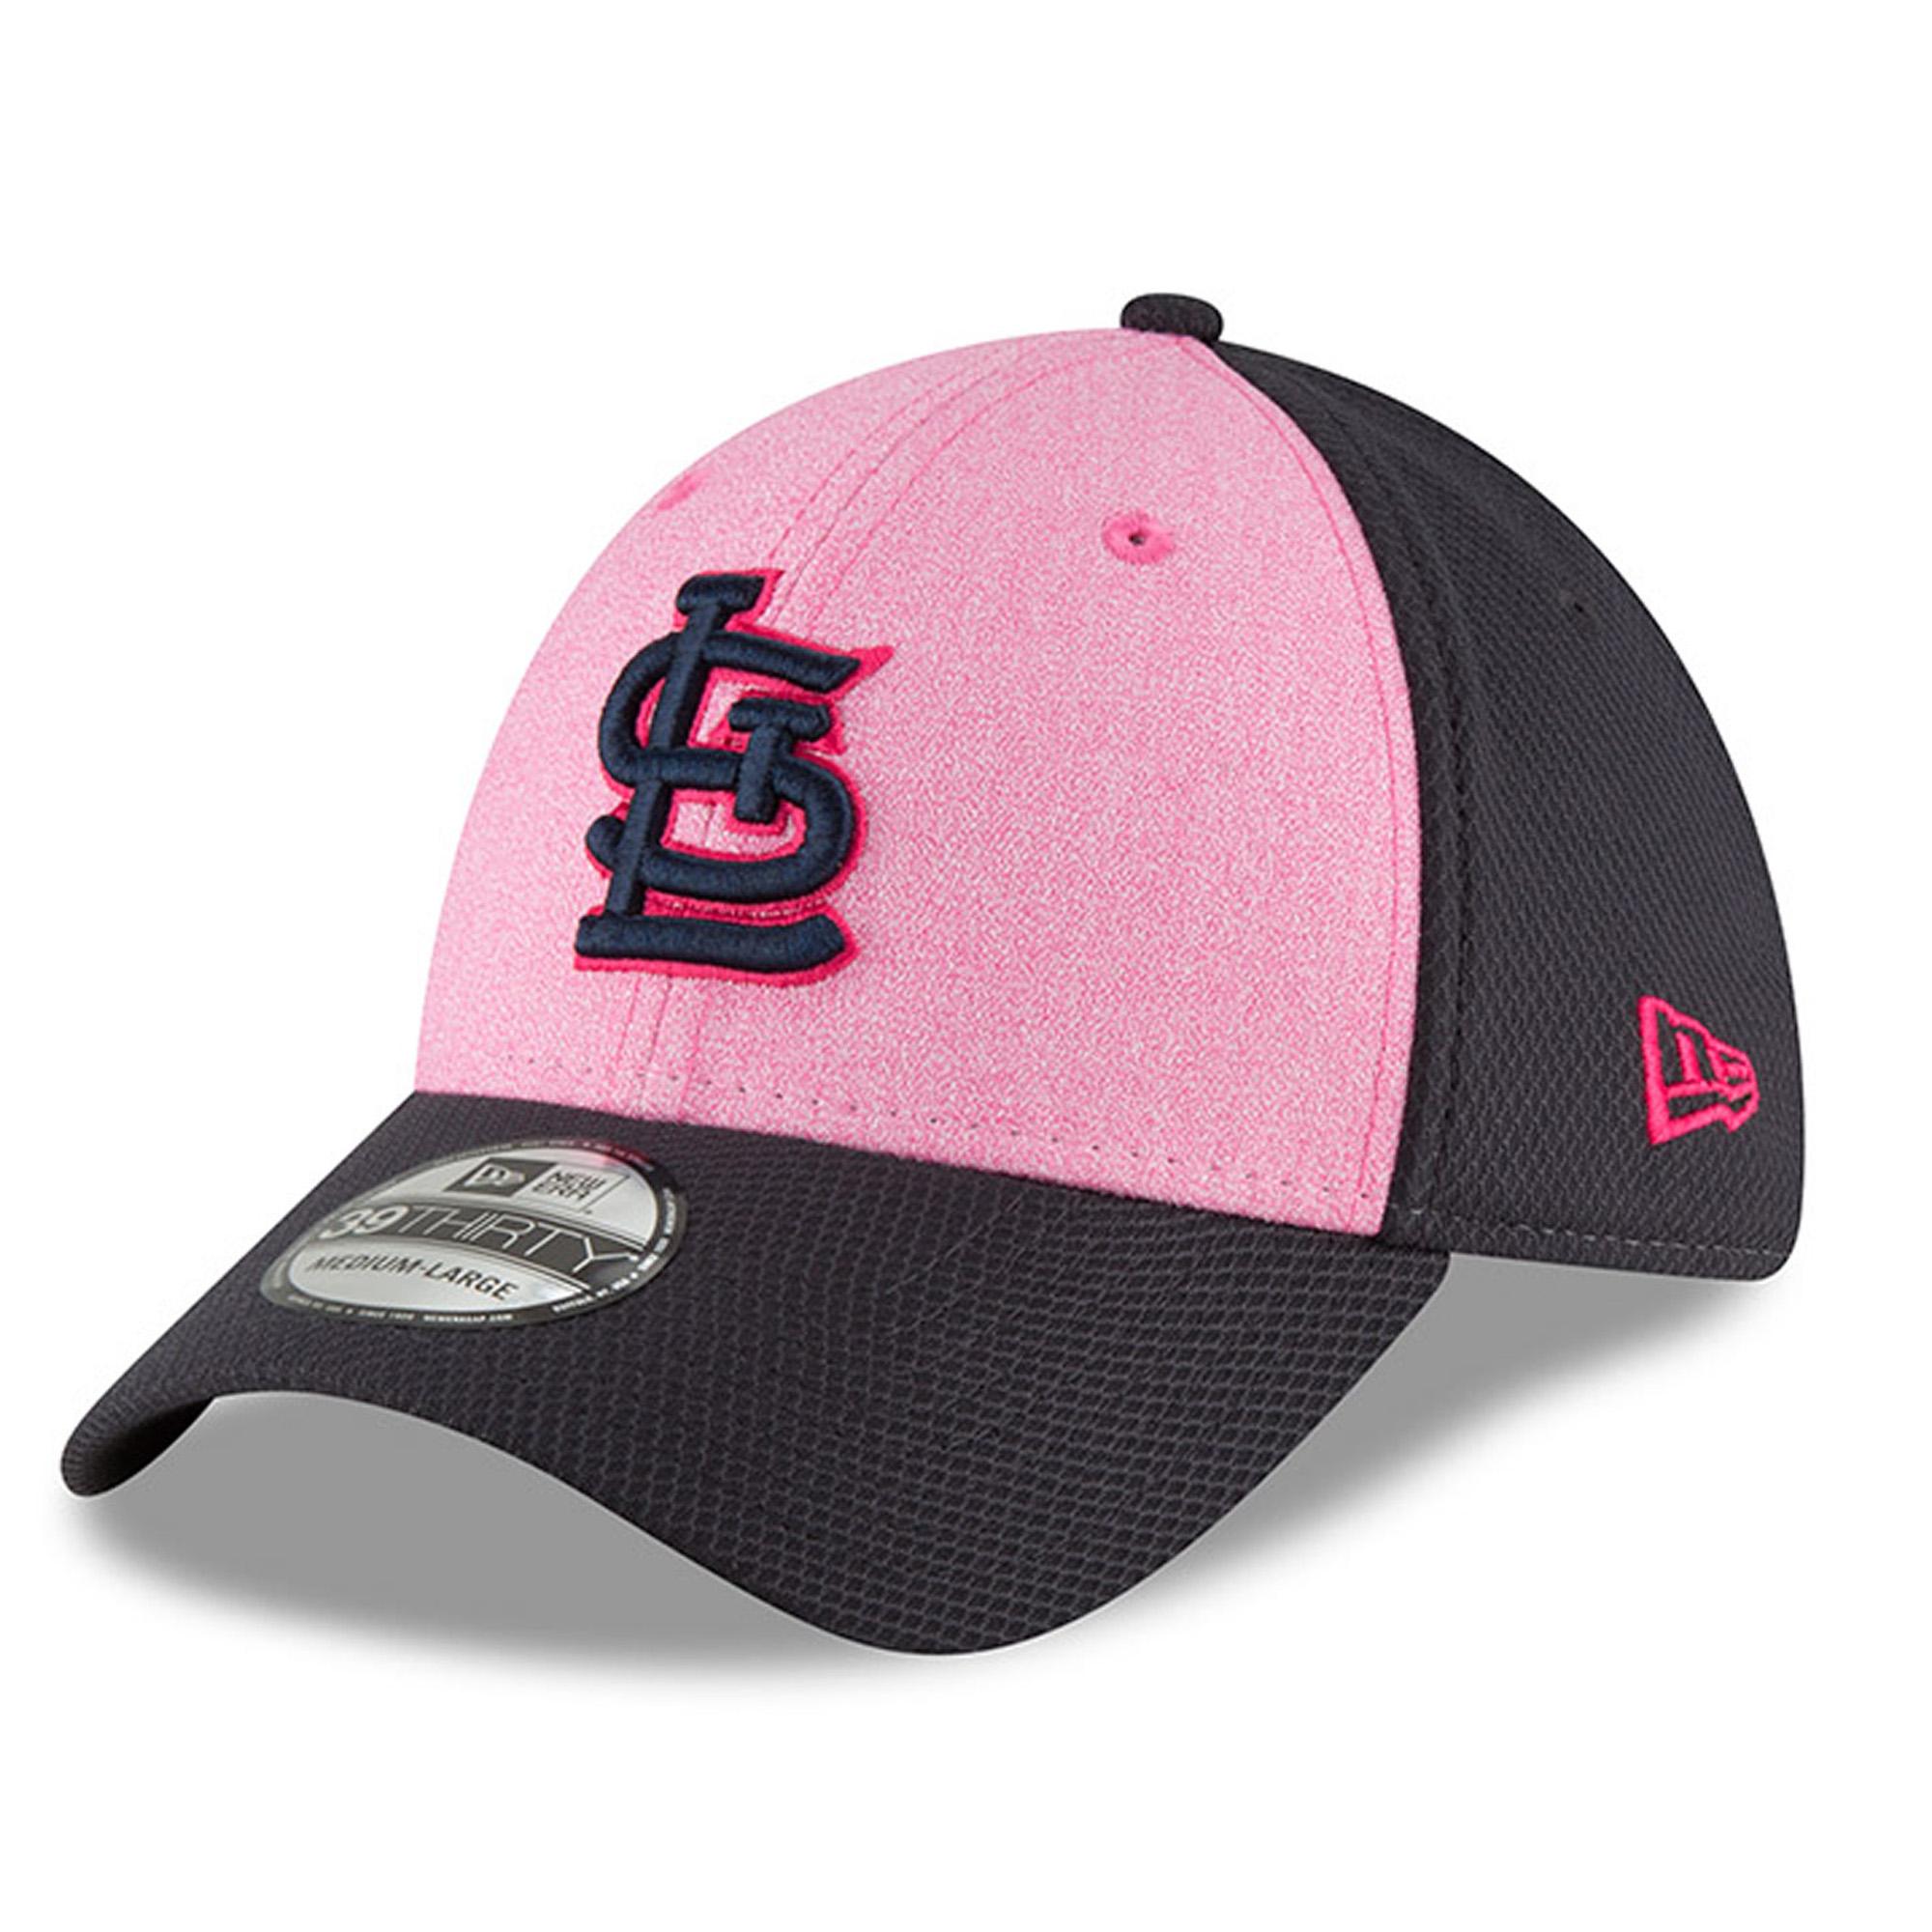 St. Louis Cardinals New Era 2018 Mother's Day 39THIRTY Flex Hat - Pink